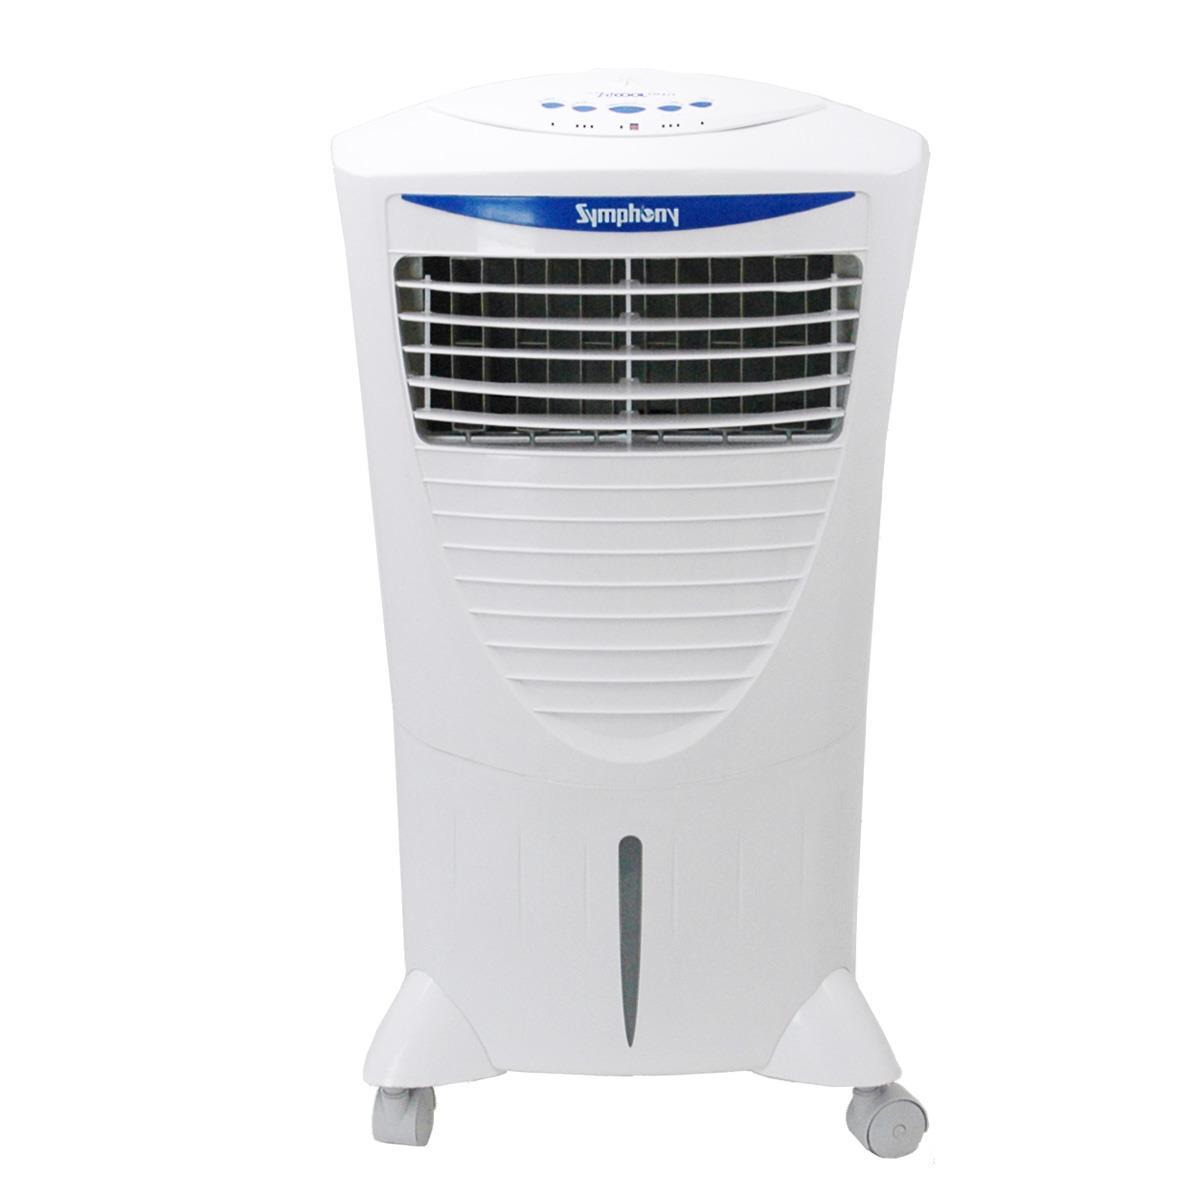 Smart Air Cooler : Symphony hi cool i smart air cooler price in bangladesh